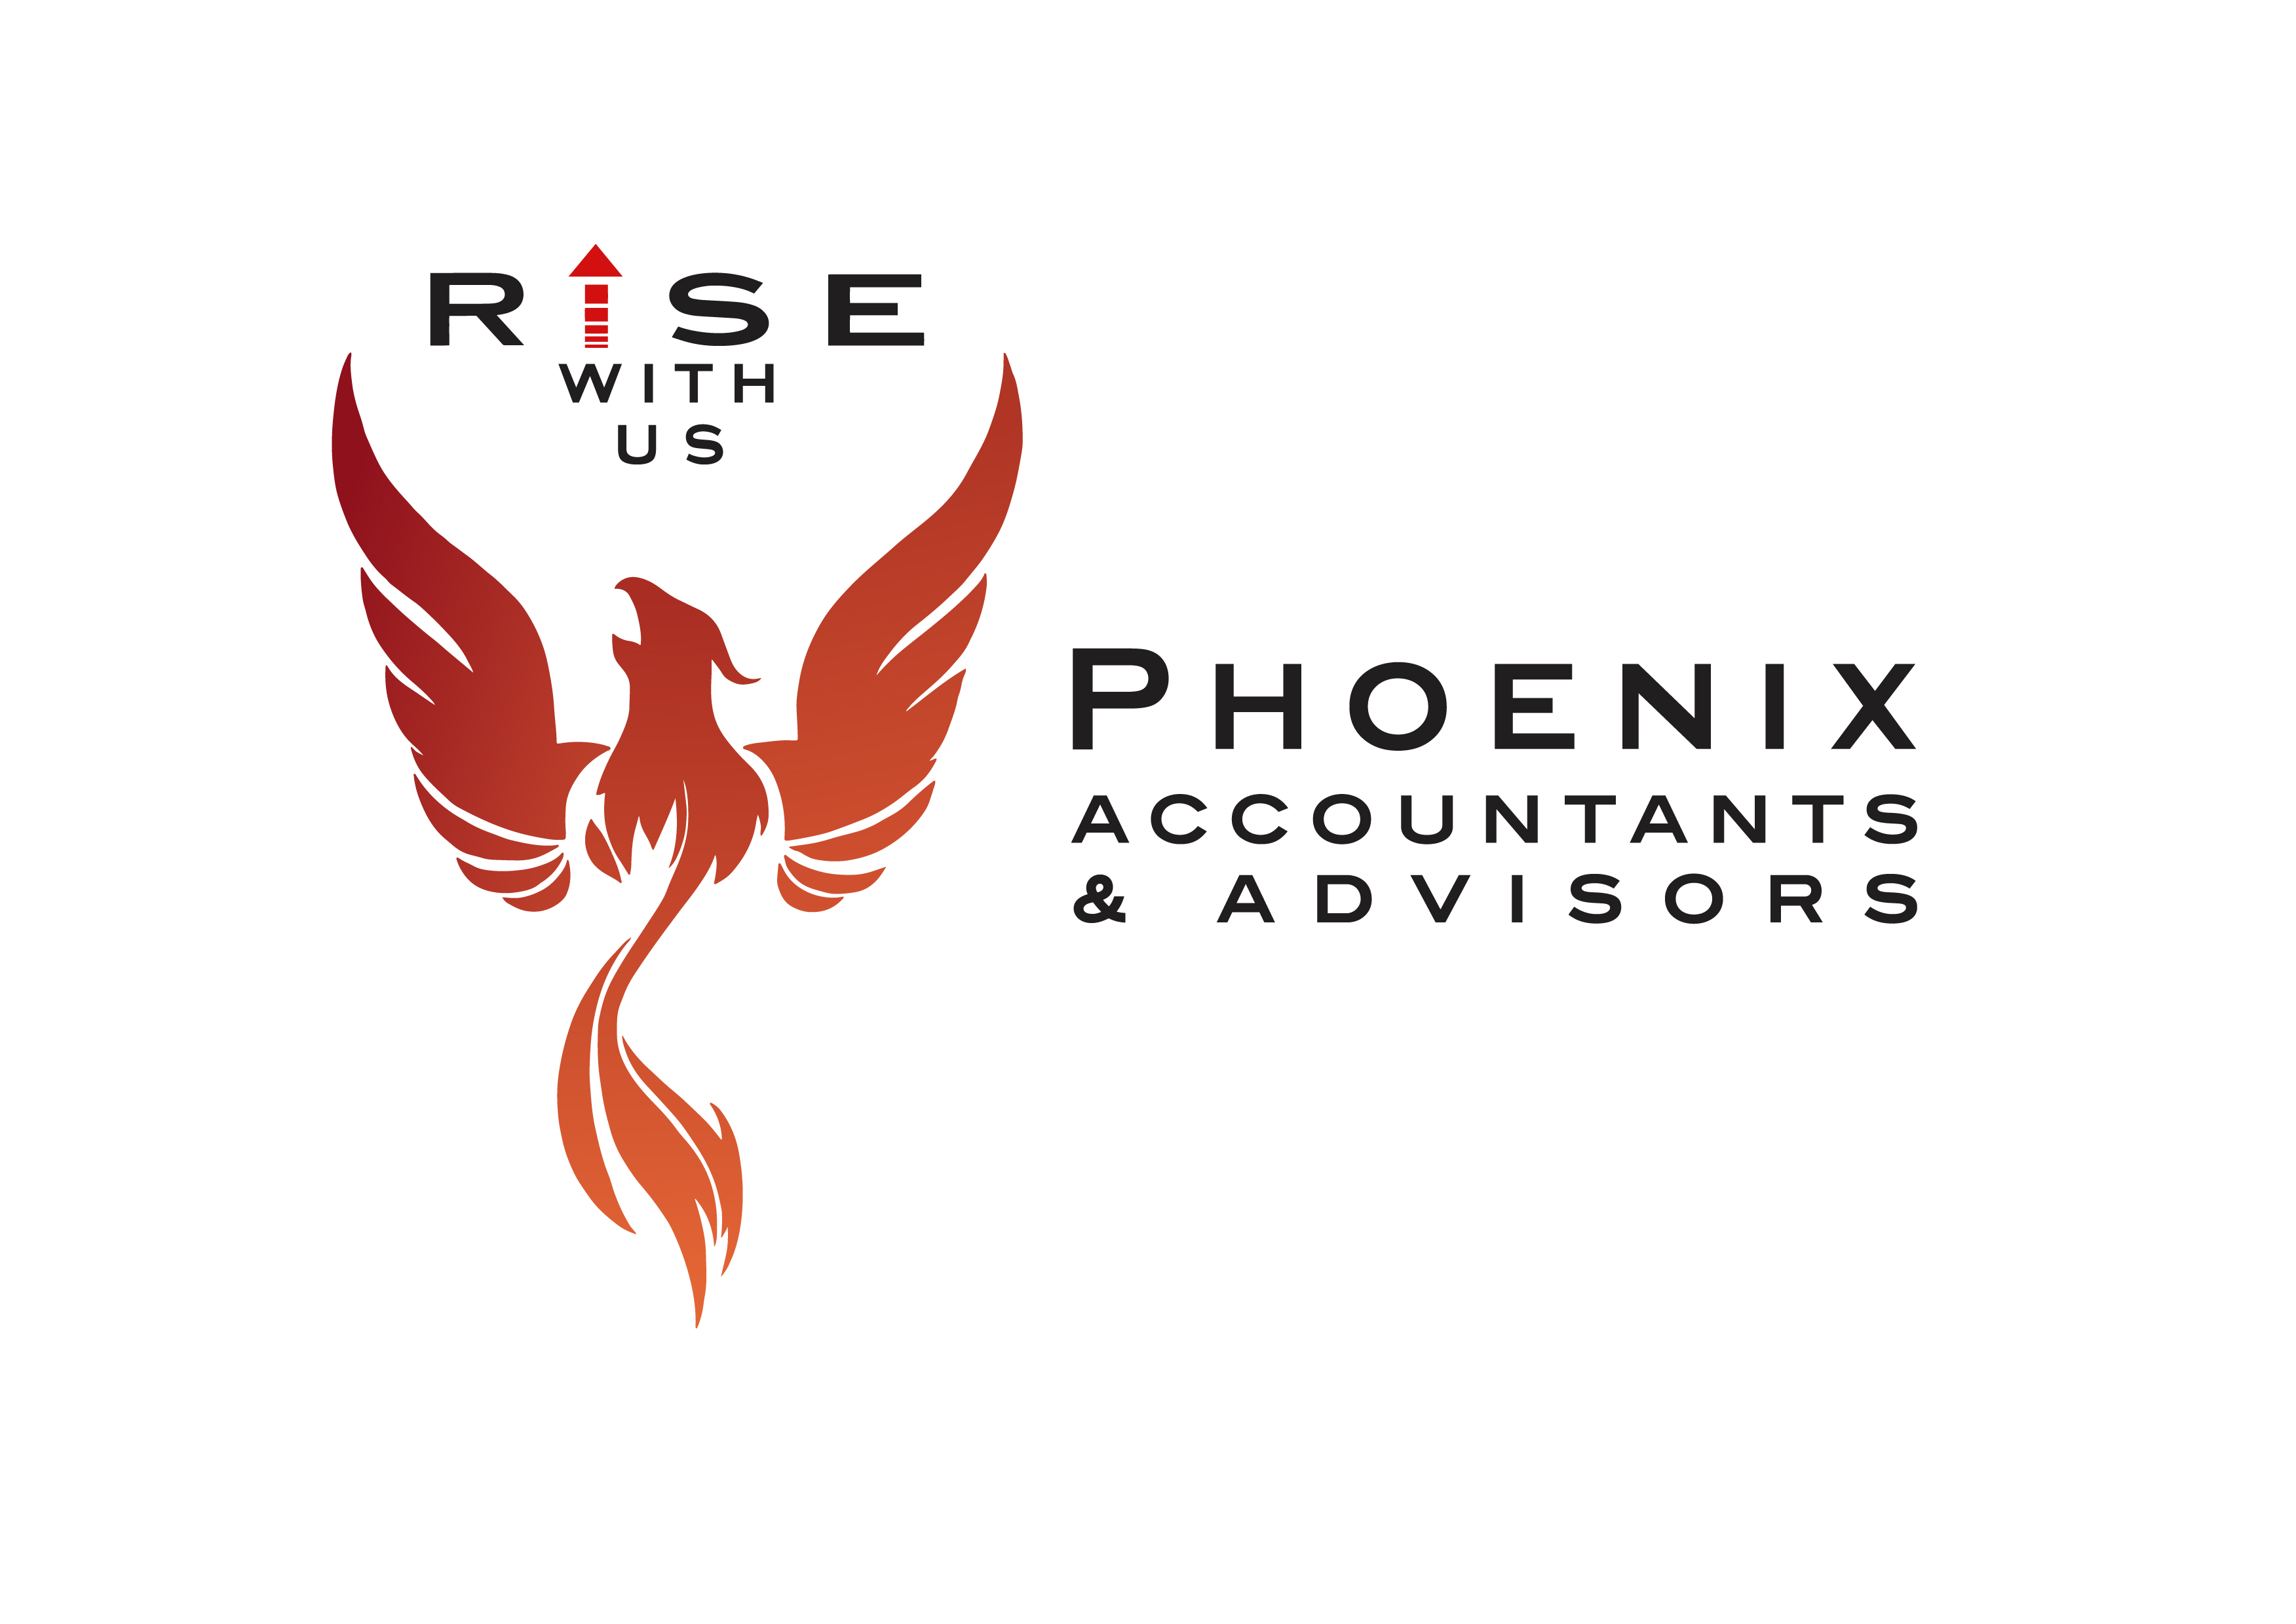 Phoenix Accountants & Advisors